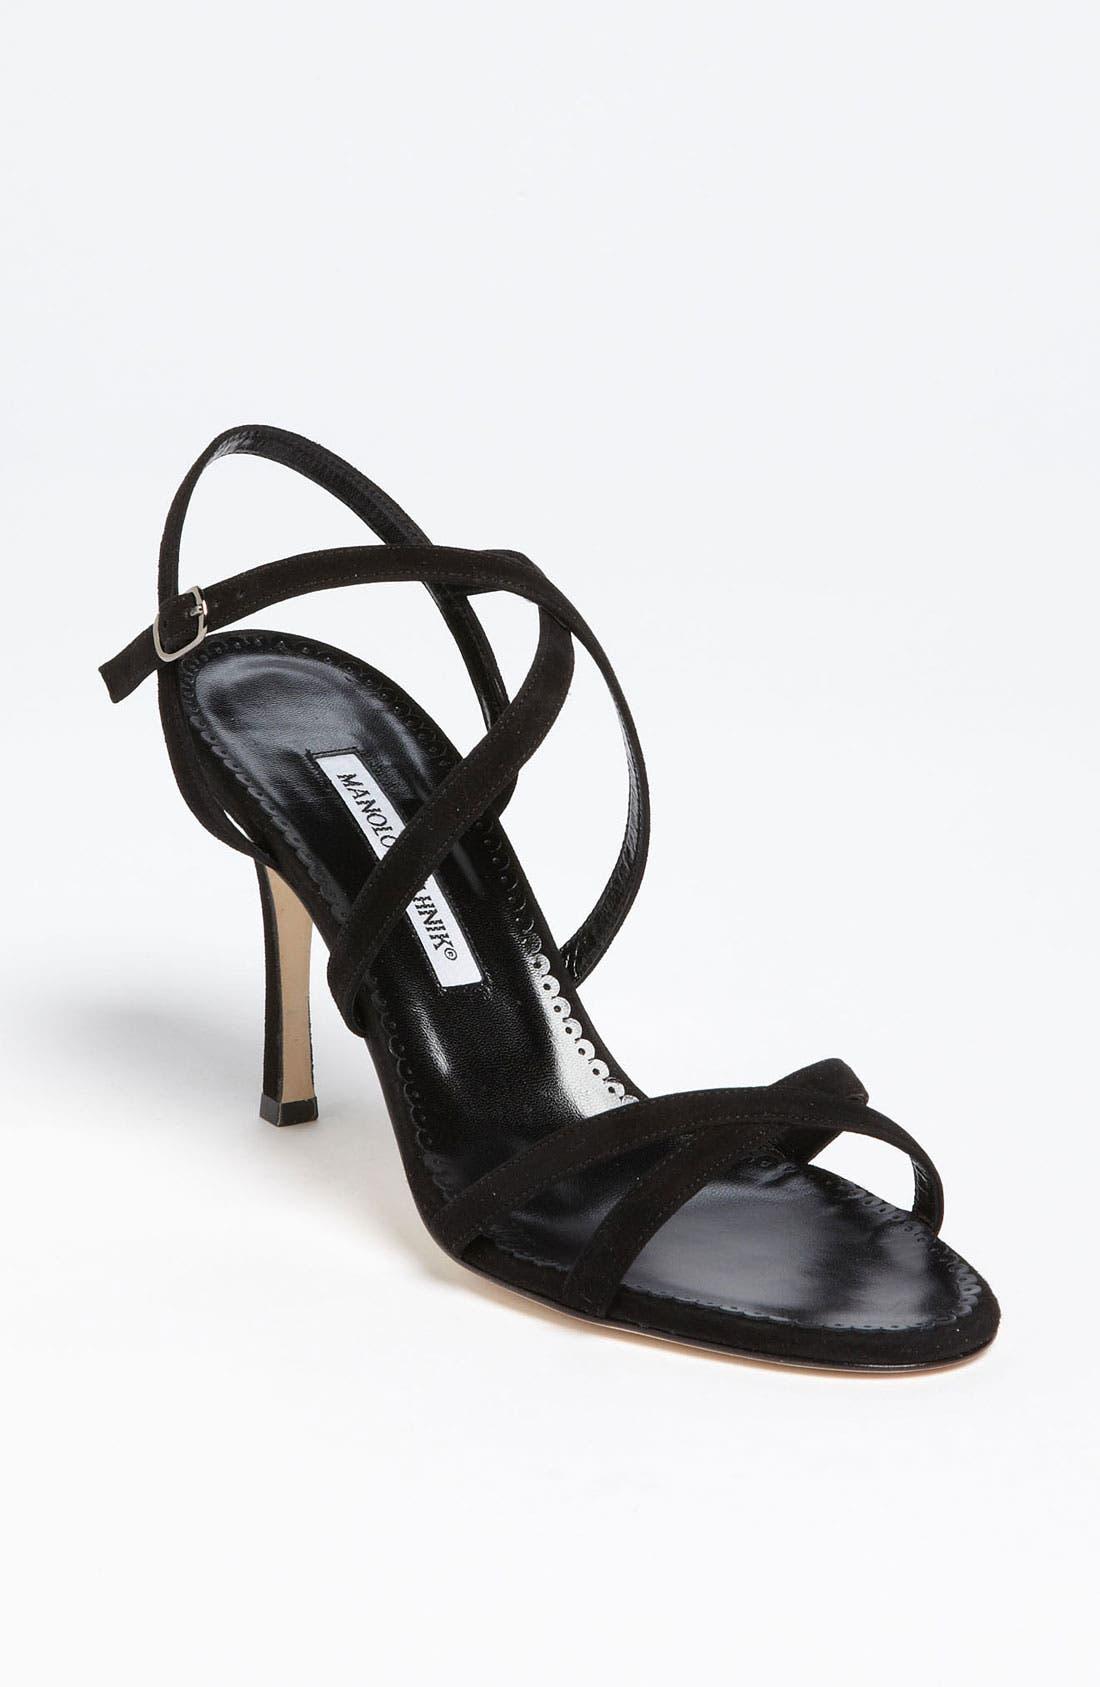 Main Image - Manolo Blahnik 'Bayan' Sandal